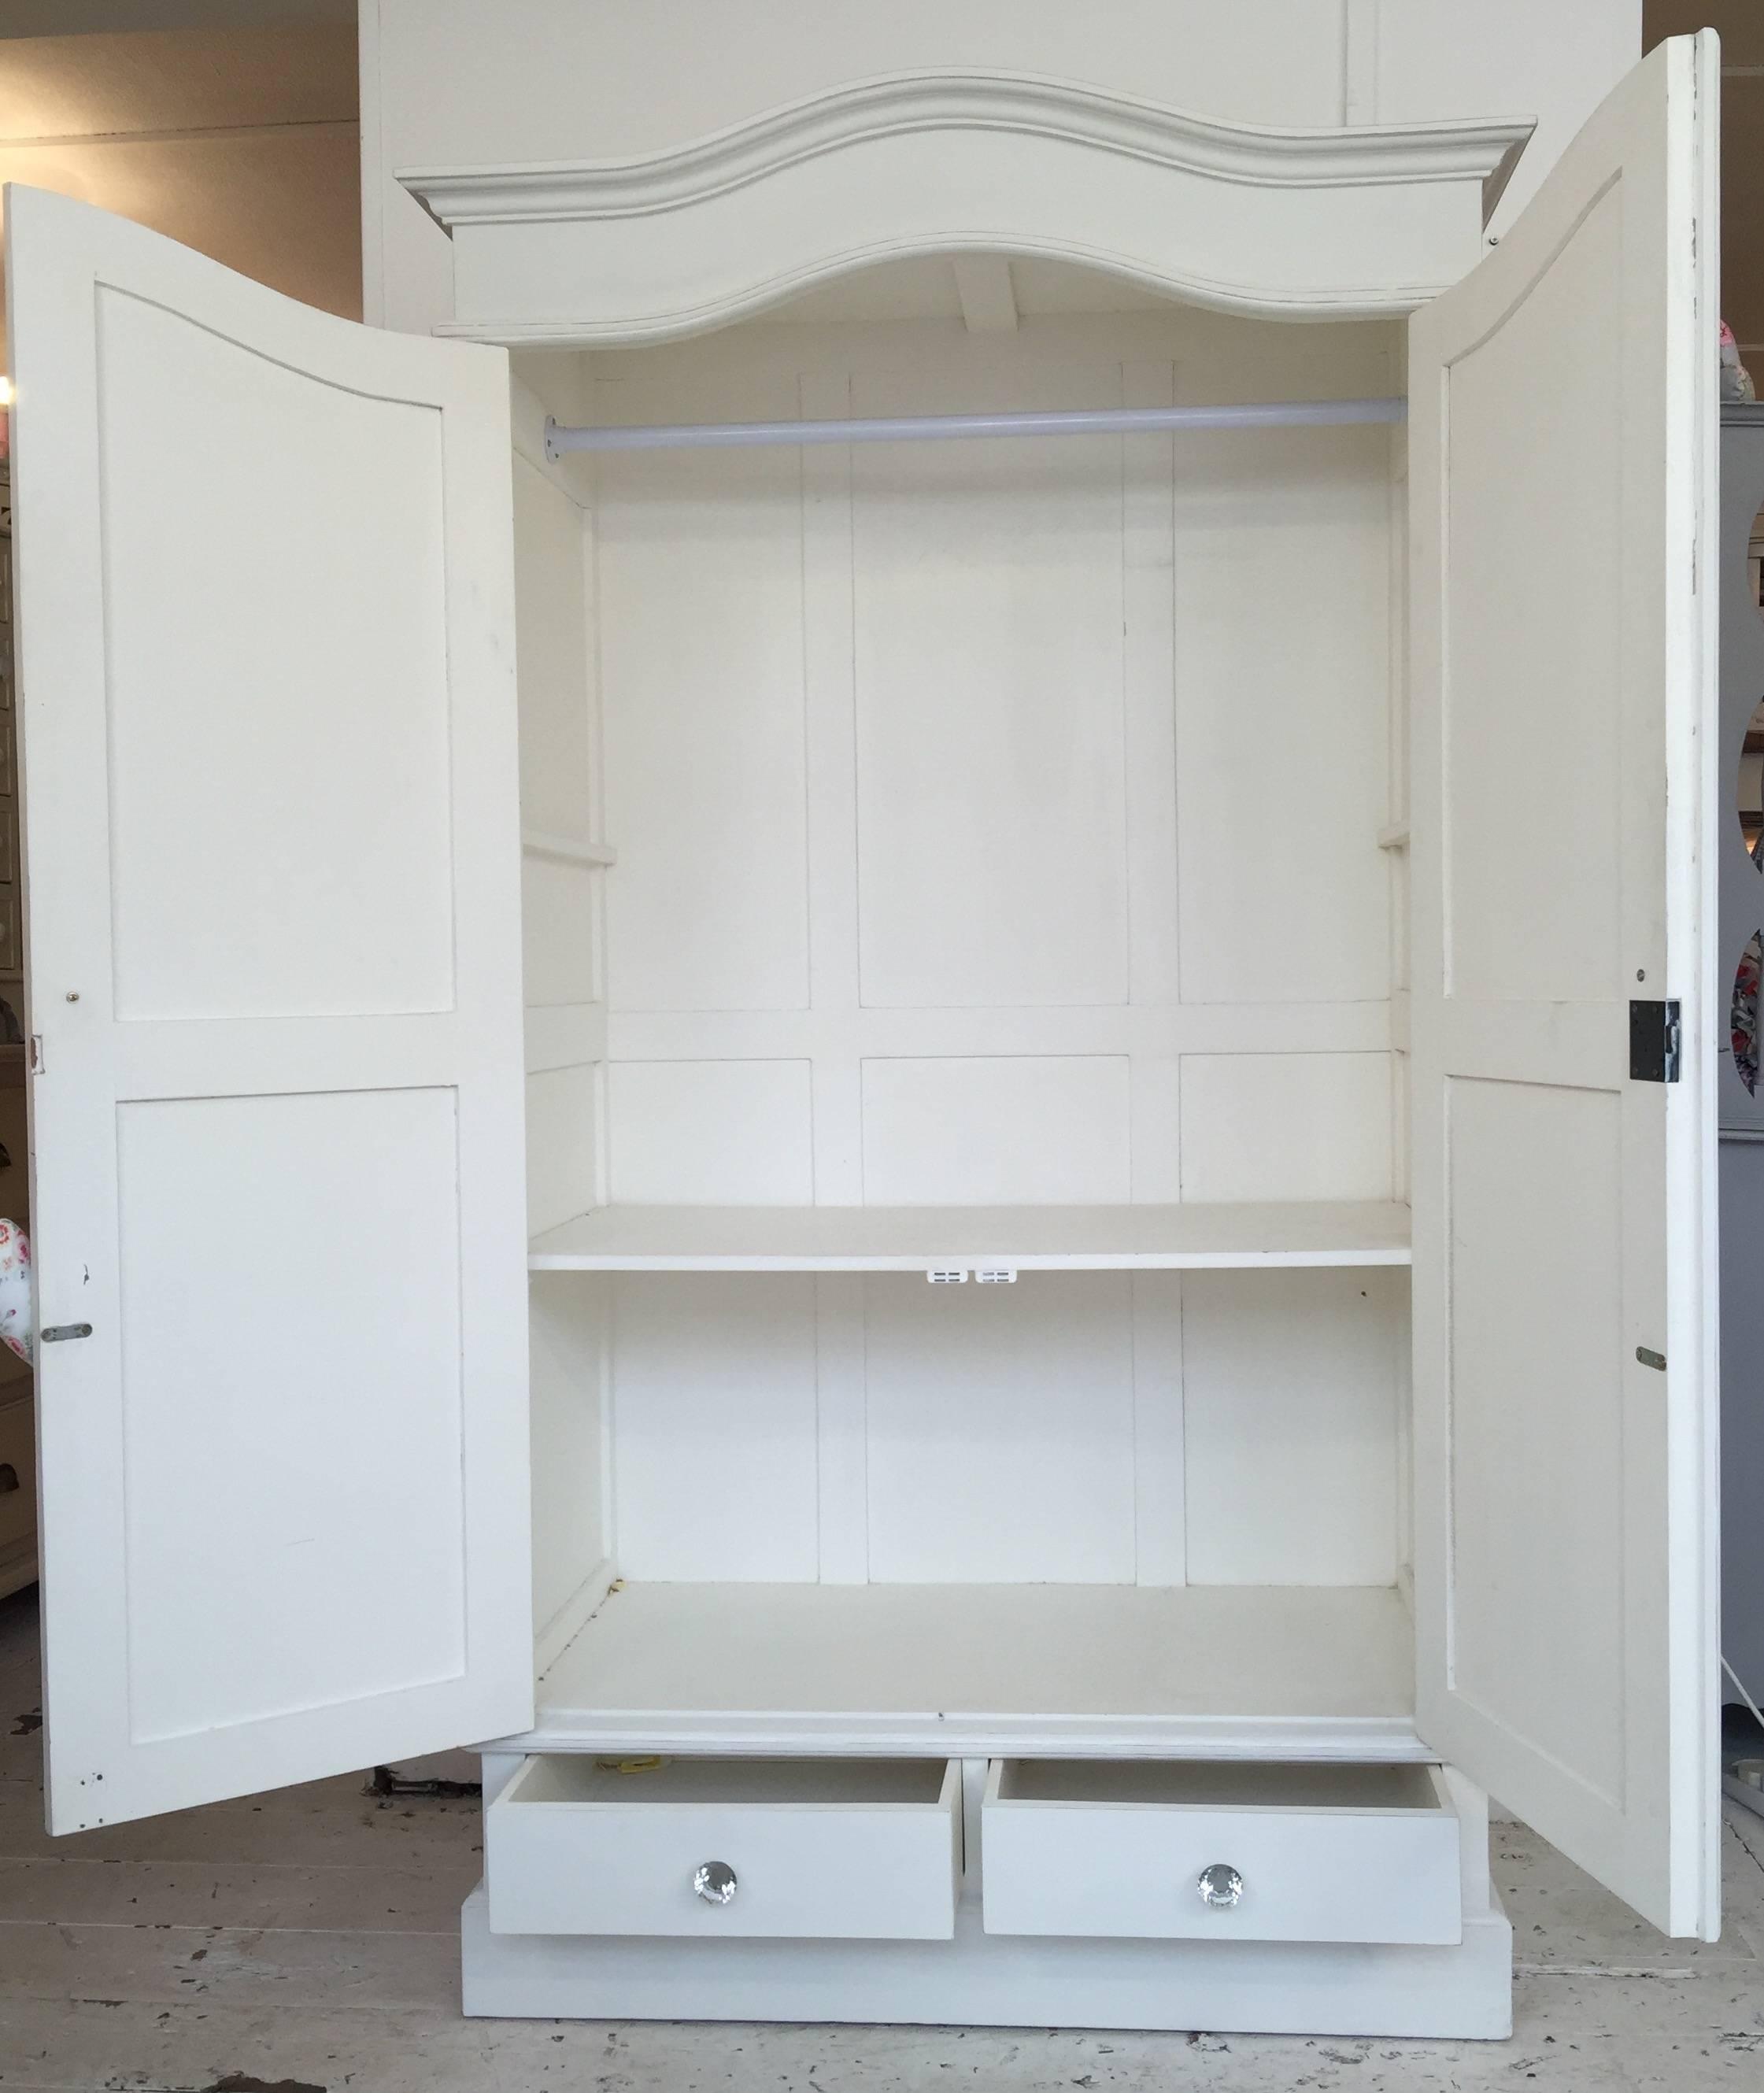 best 15 of white shabby chic wardrobes. Black Bedroom Furniture Sets. Home Design Ideas